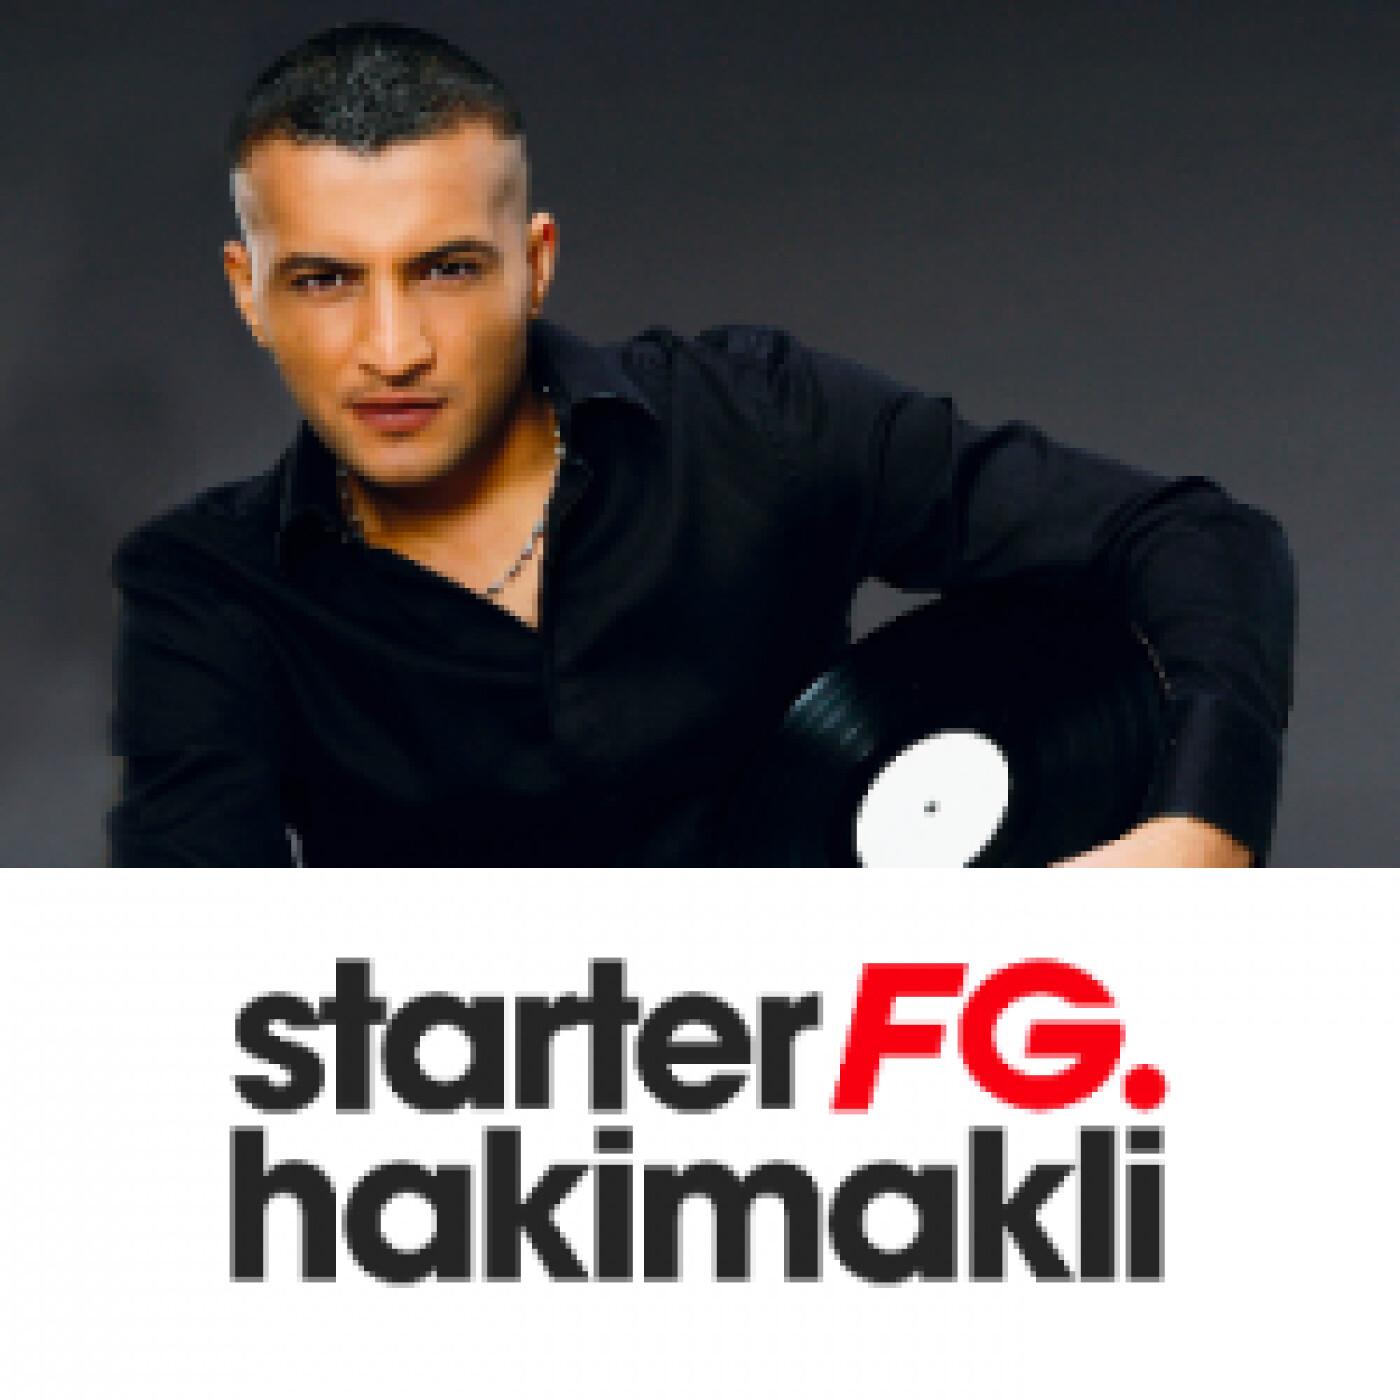 STARTER FG BY HAKIMAKLI MARDI 20 AVRIL 2021